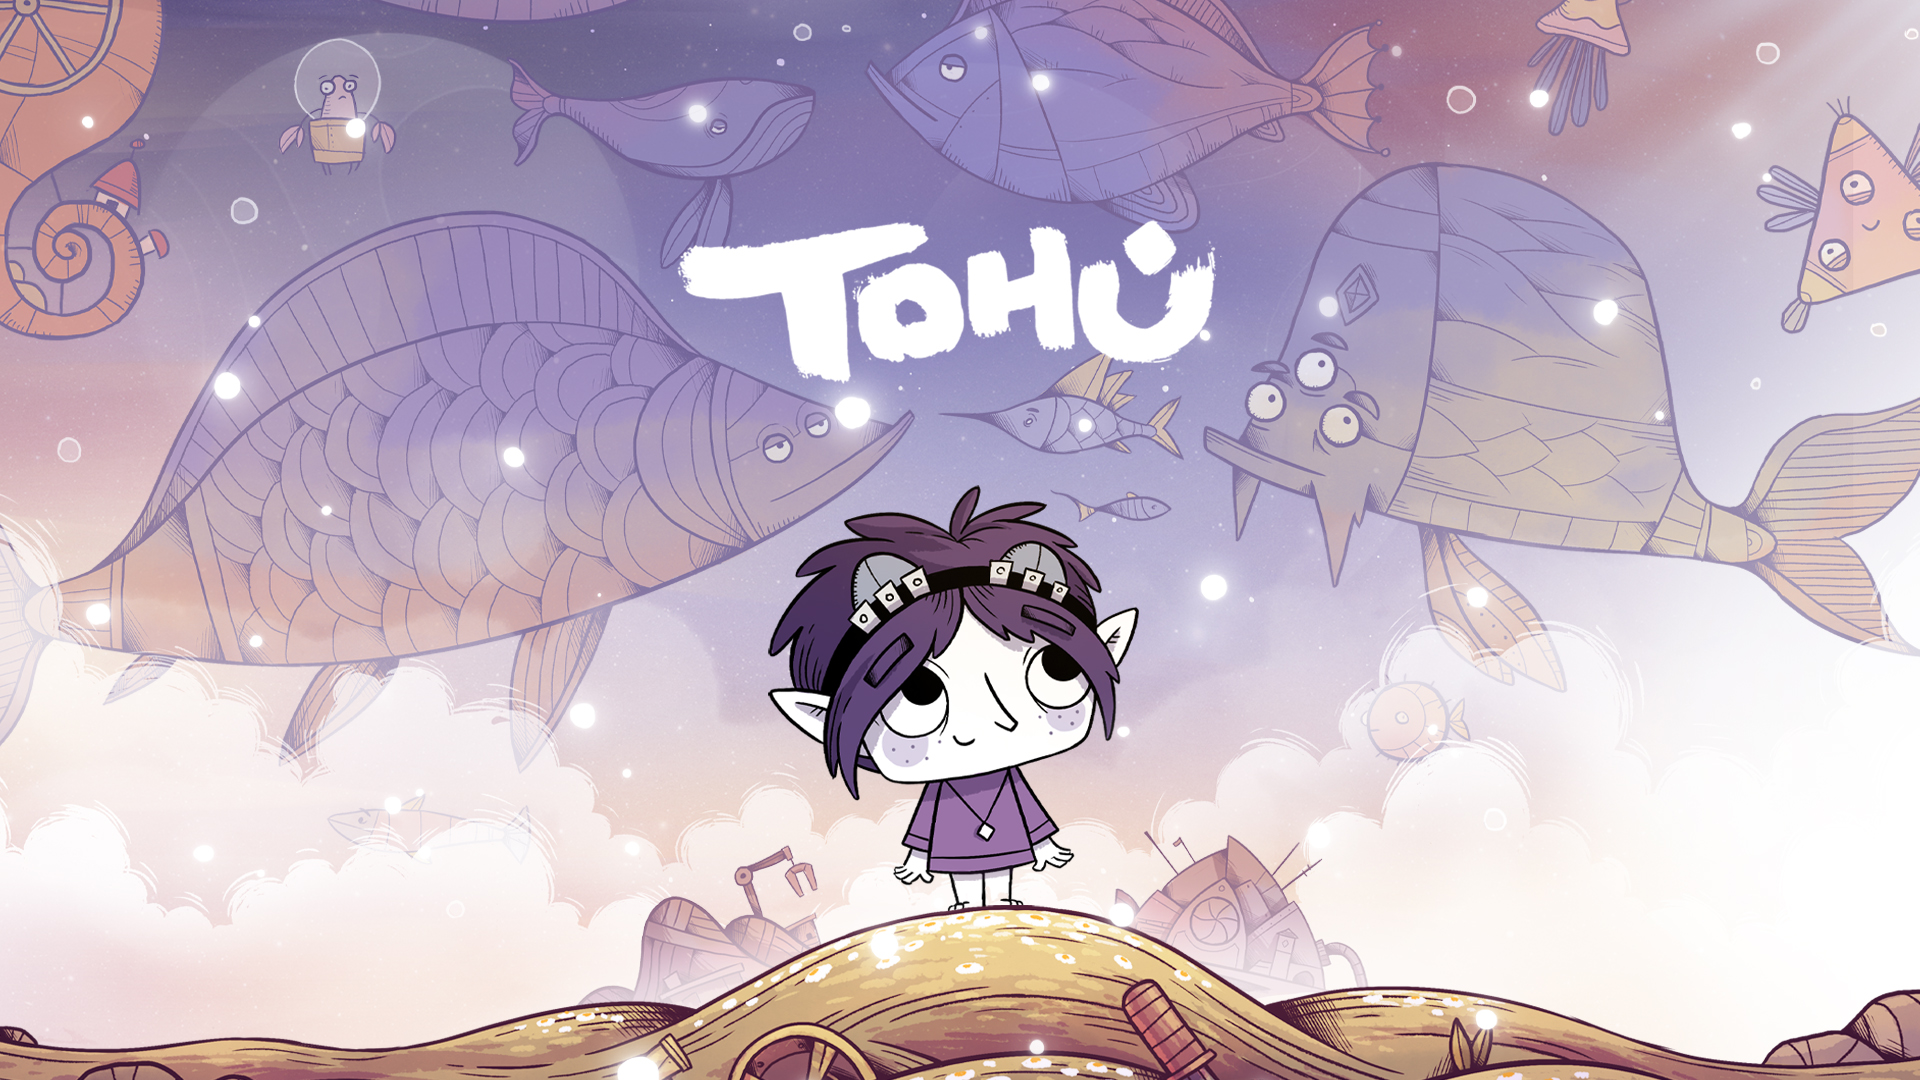 tohu game hd wallpaper 73441